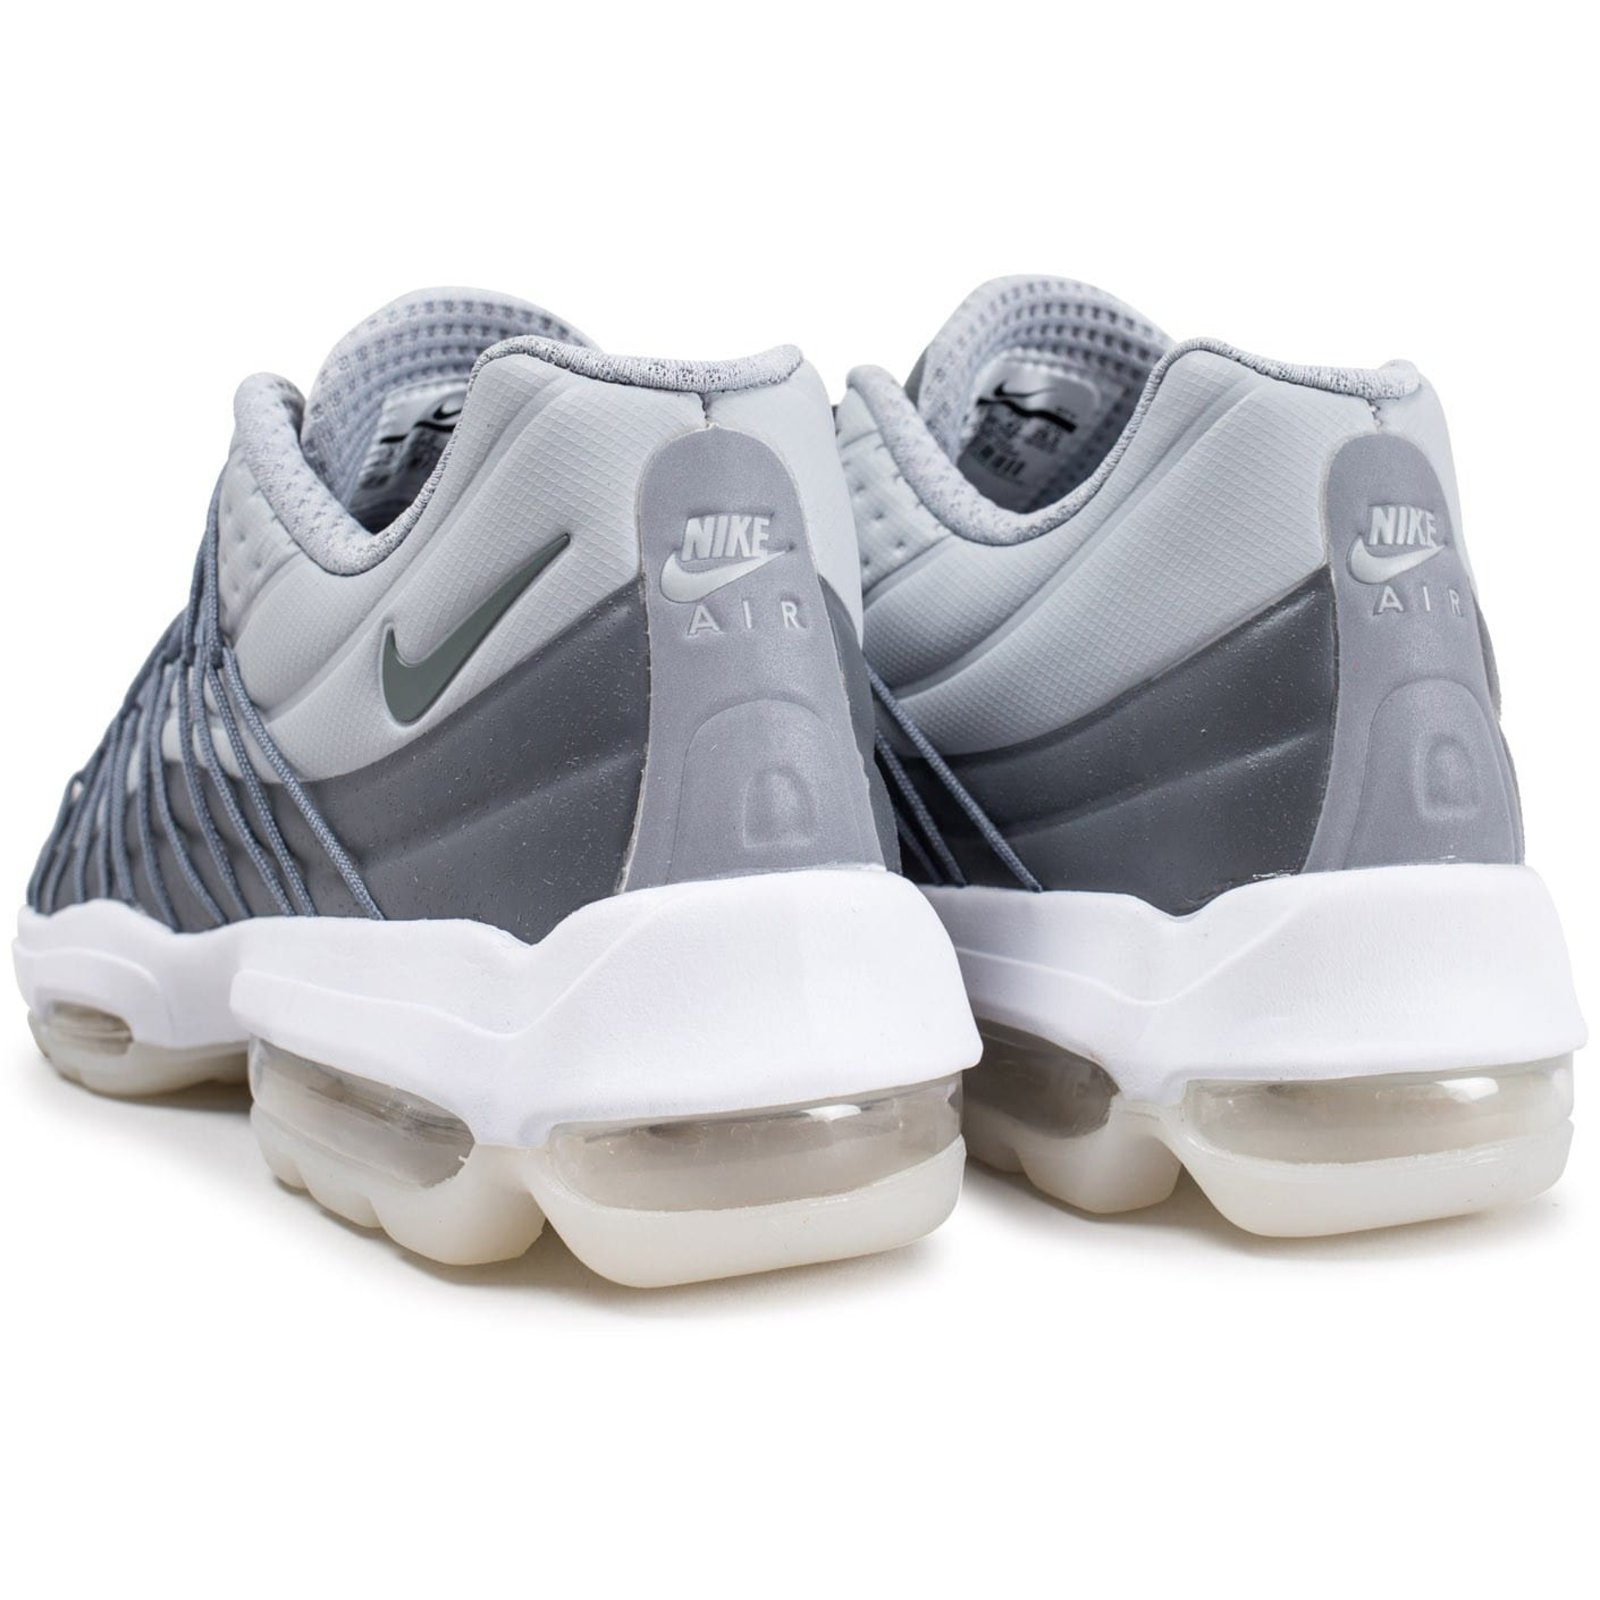 Nike Air max 95 ultra Sneakers Sneakers Rubber Grey ref